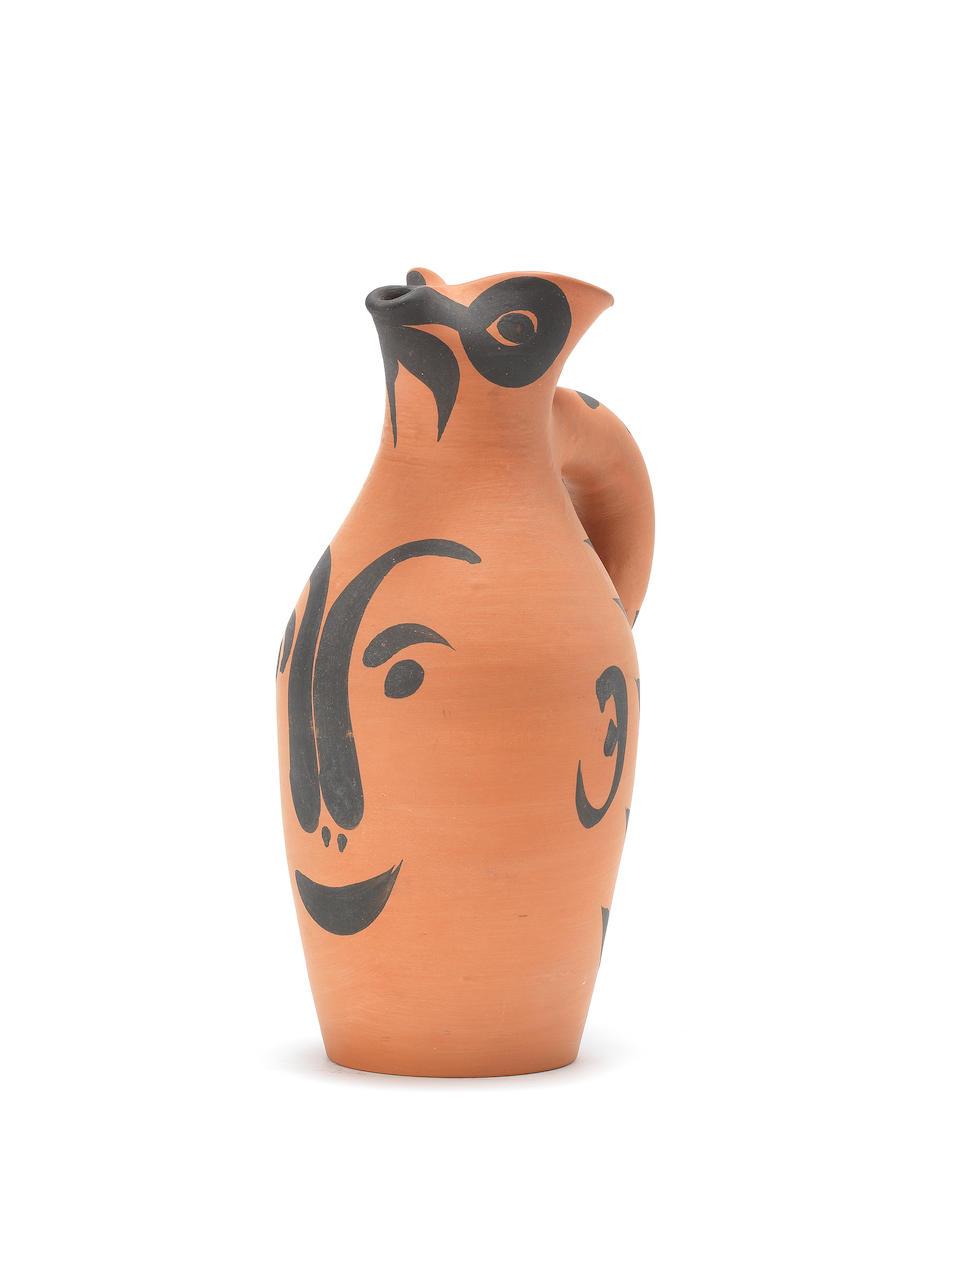 Pablo Picasso (1881-1973) Yan visage 27cm (10 5/8in) high